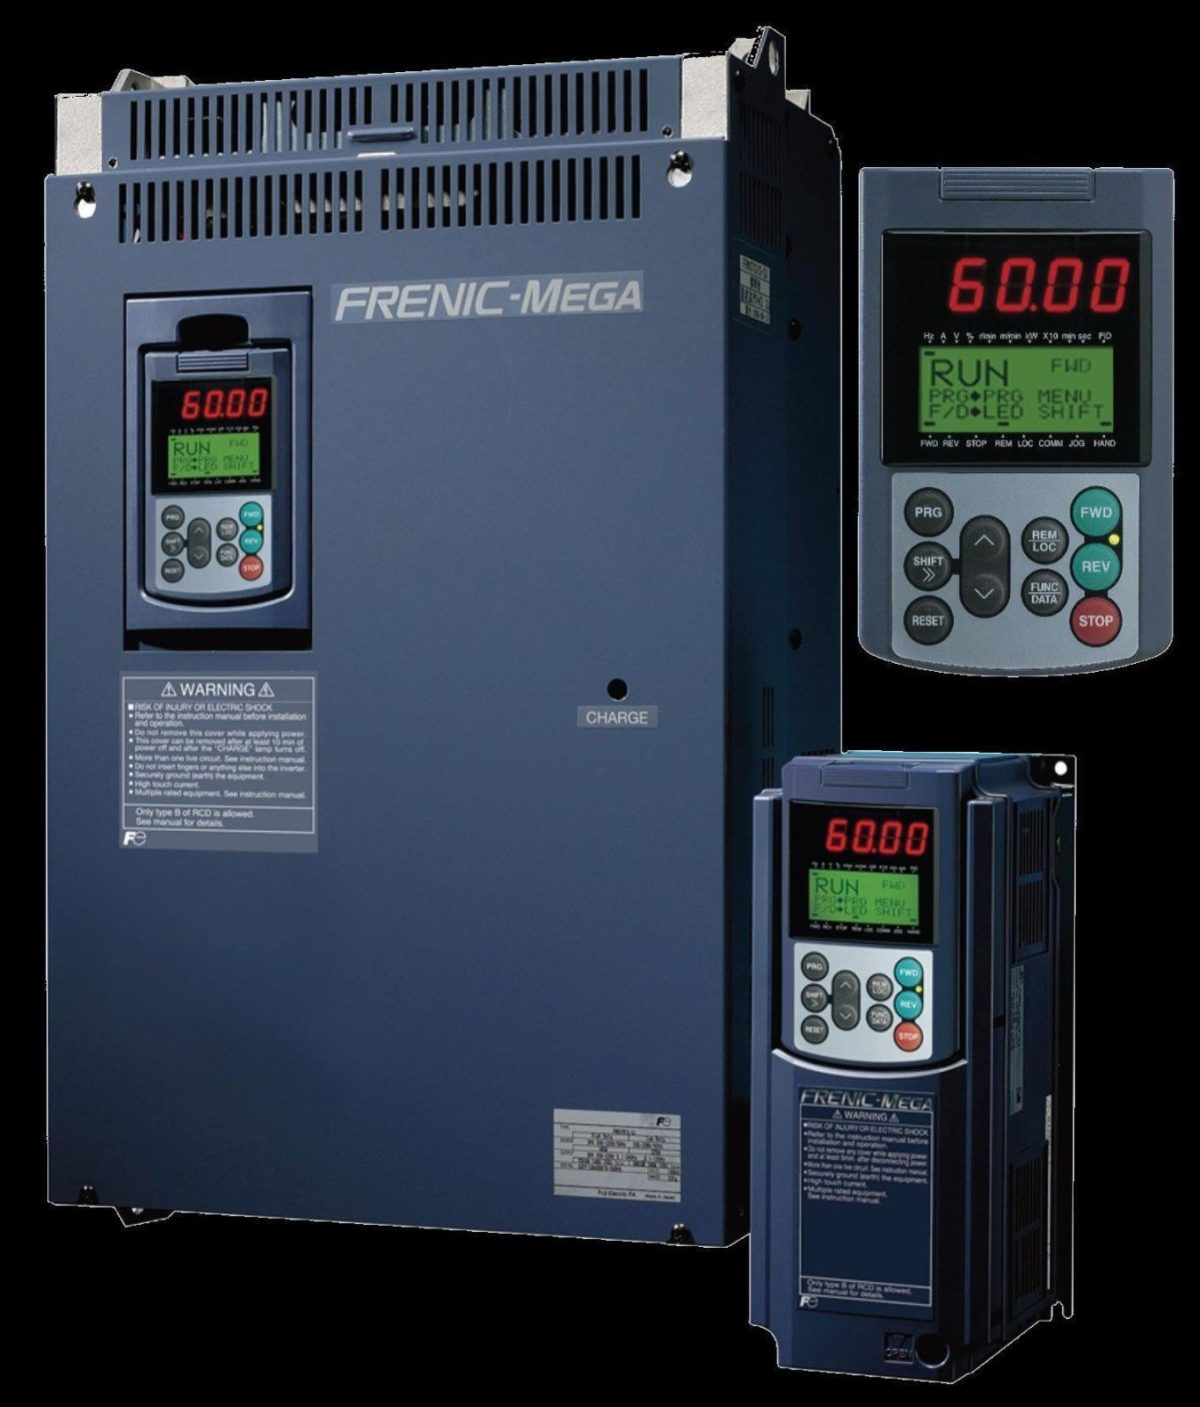 FRN500G1S-4U FRN450G1S-4U FRN350G1S-4U FRN300G1S-4U FRN250G1S-4U FRN200G1S-4U FRN150G1S-4U FRN100G1S-4U FRN125G1S-4U